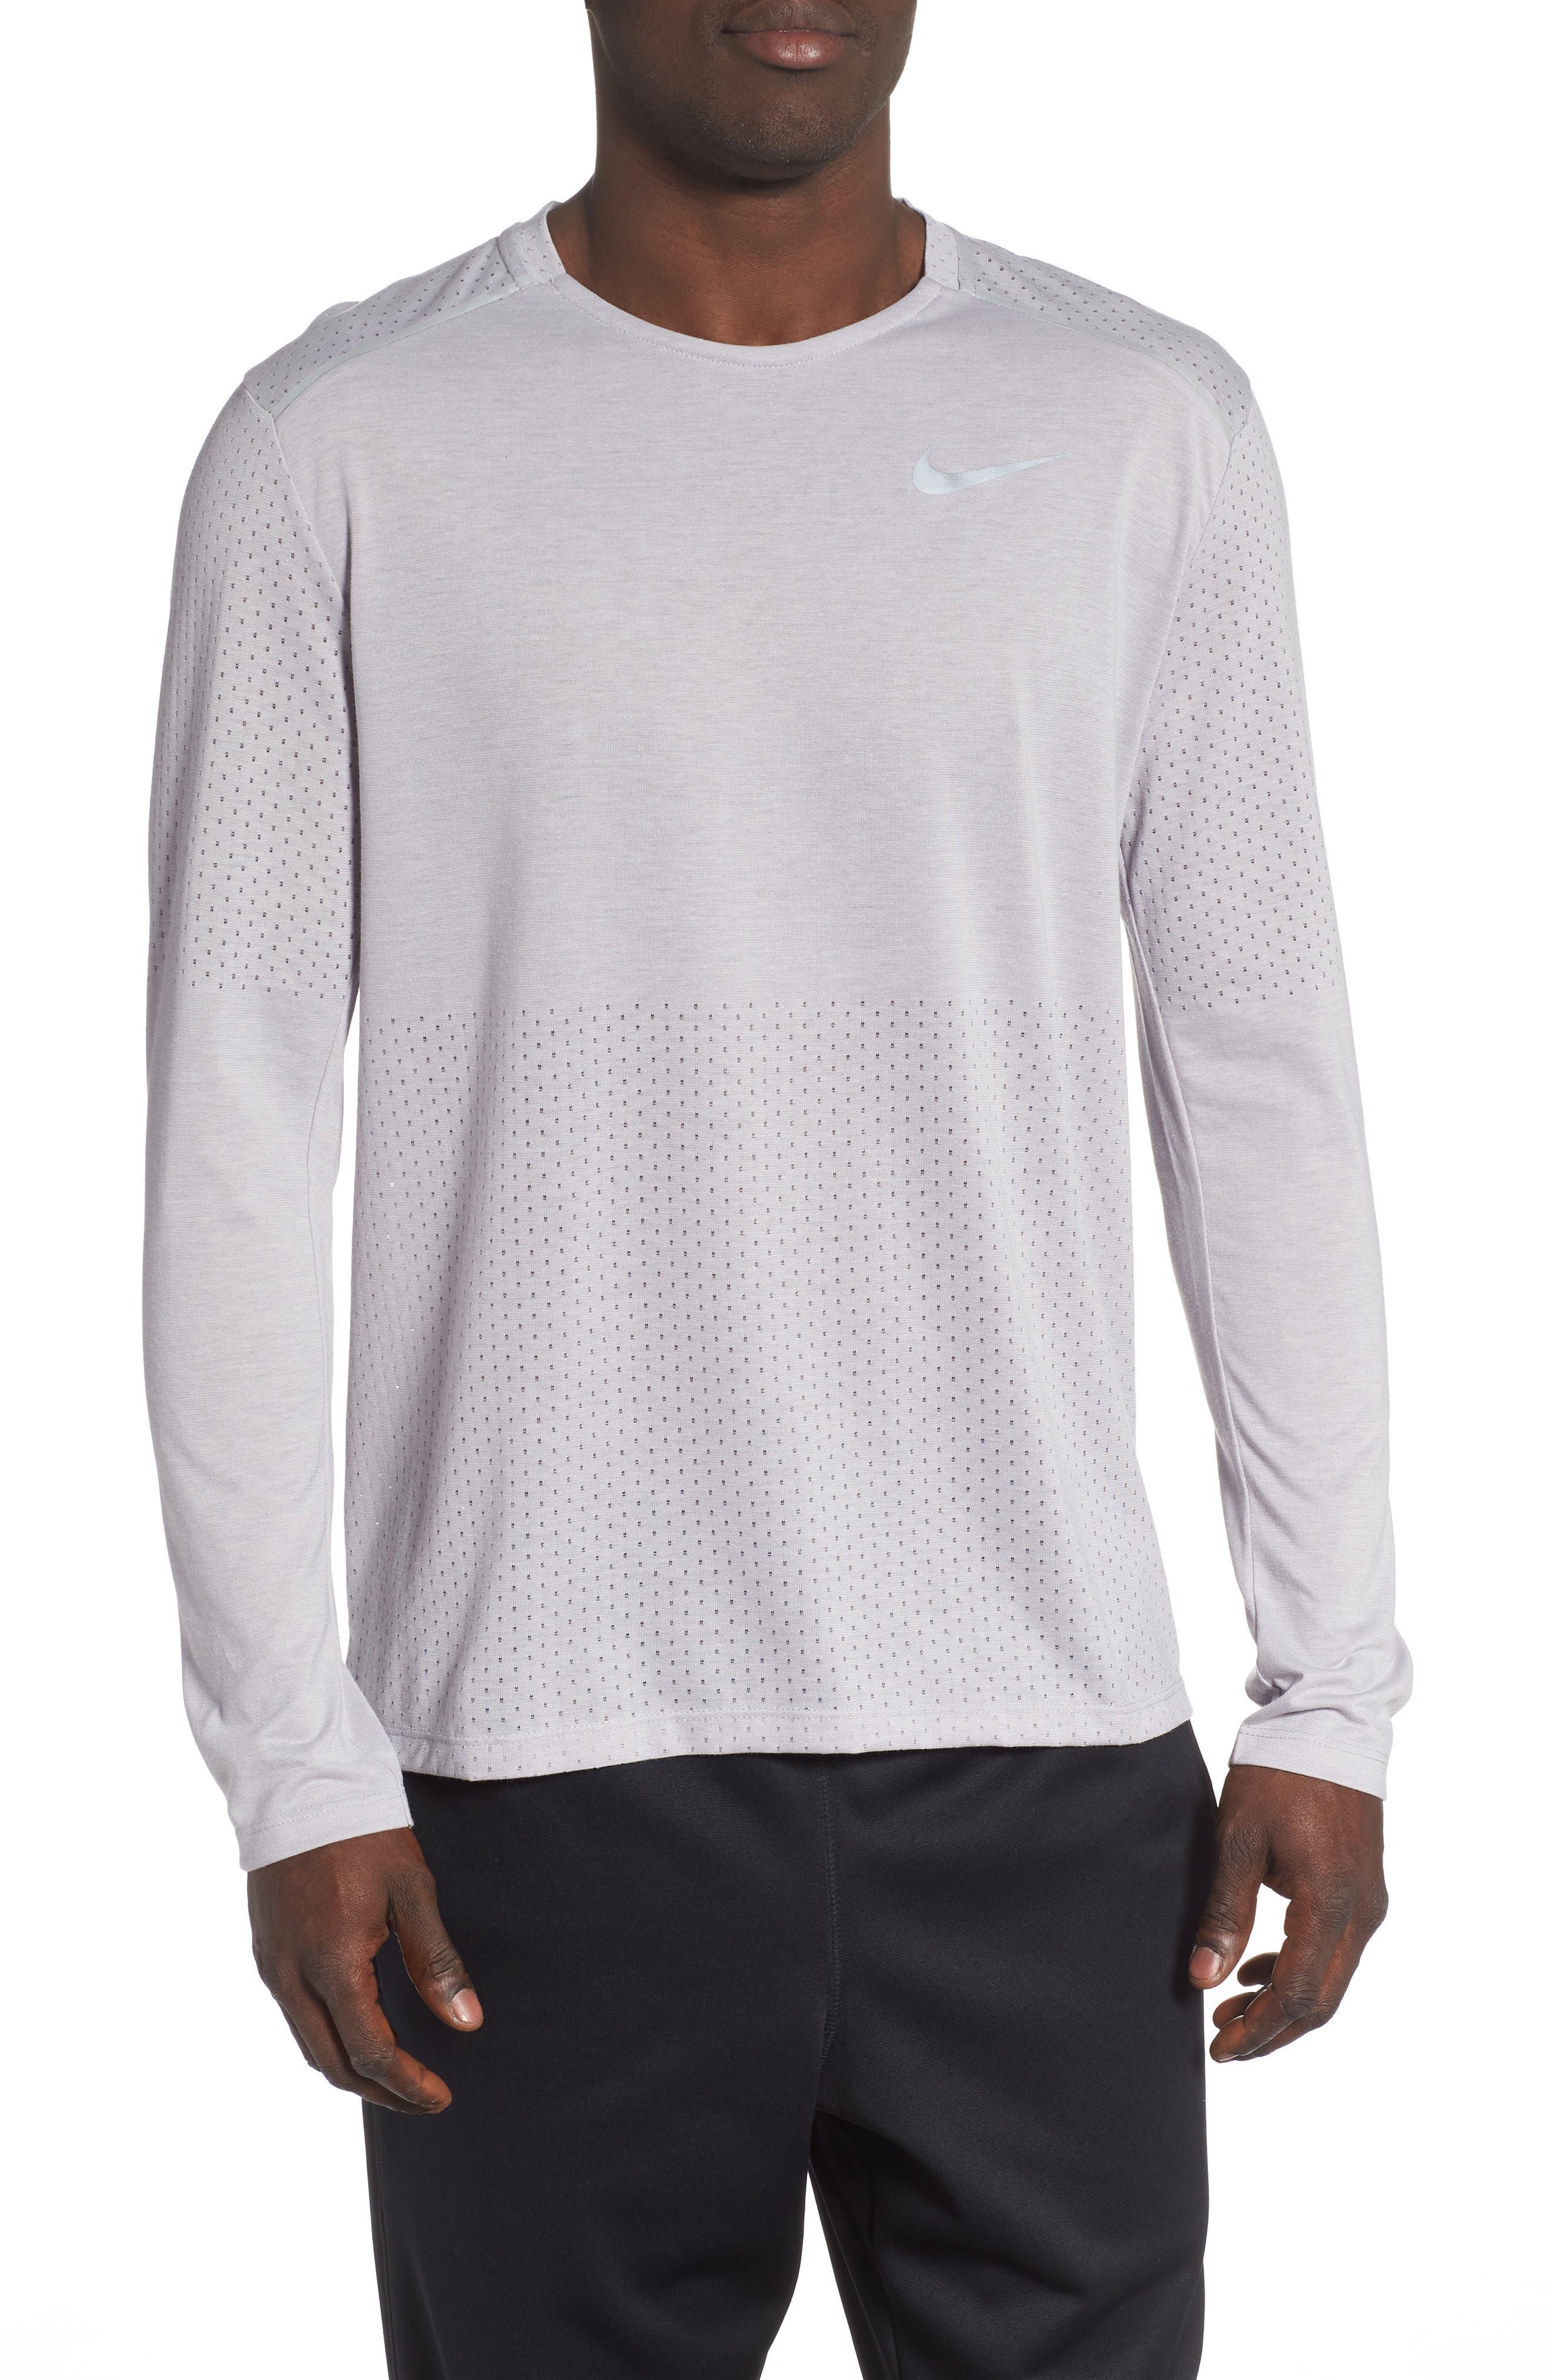 Nike Breathe Rise 365 Running T-Shirt